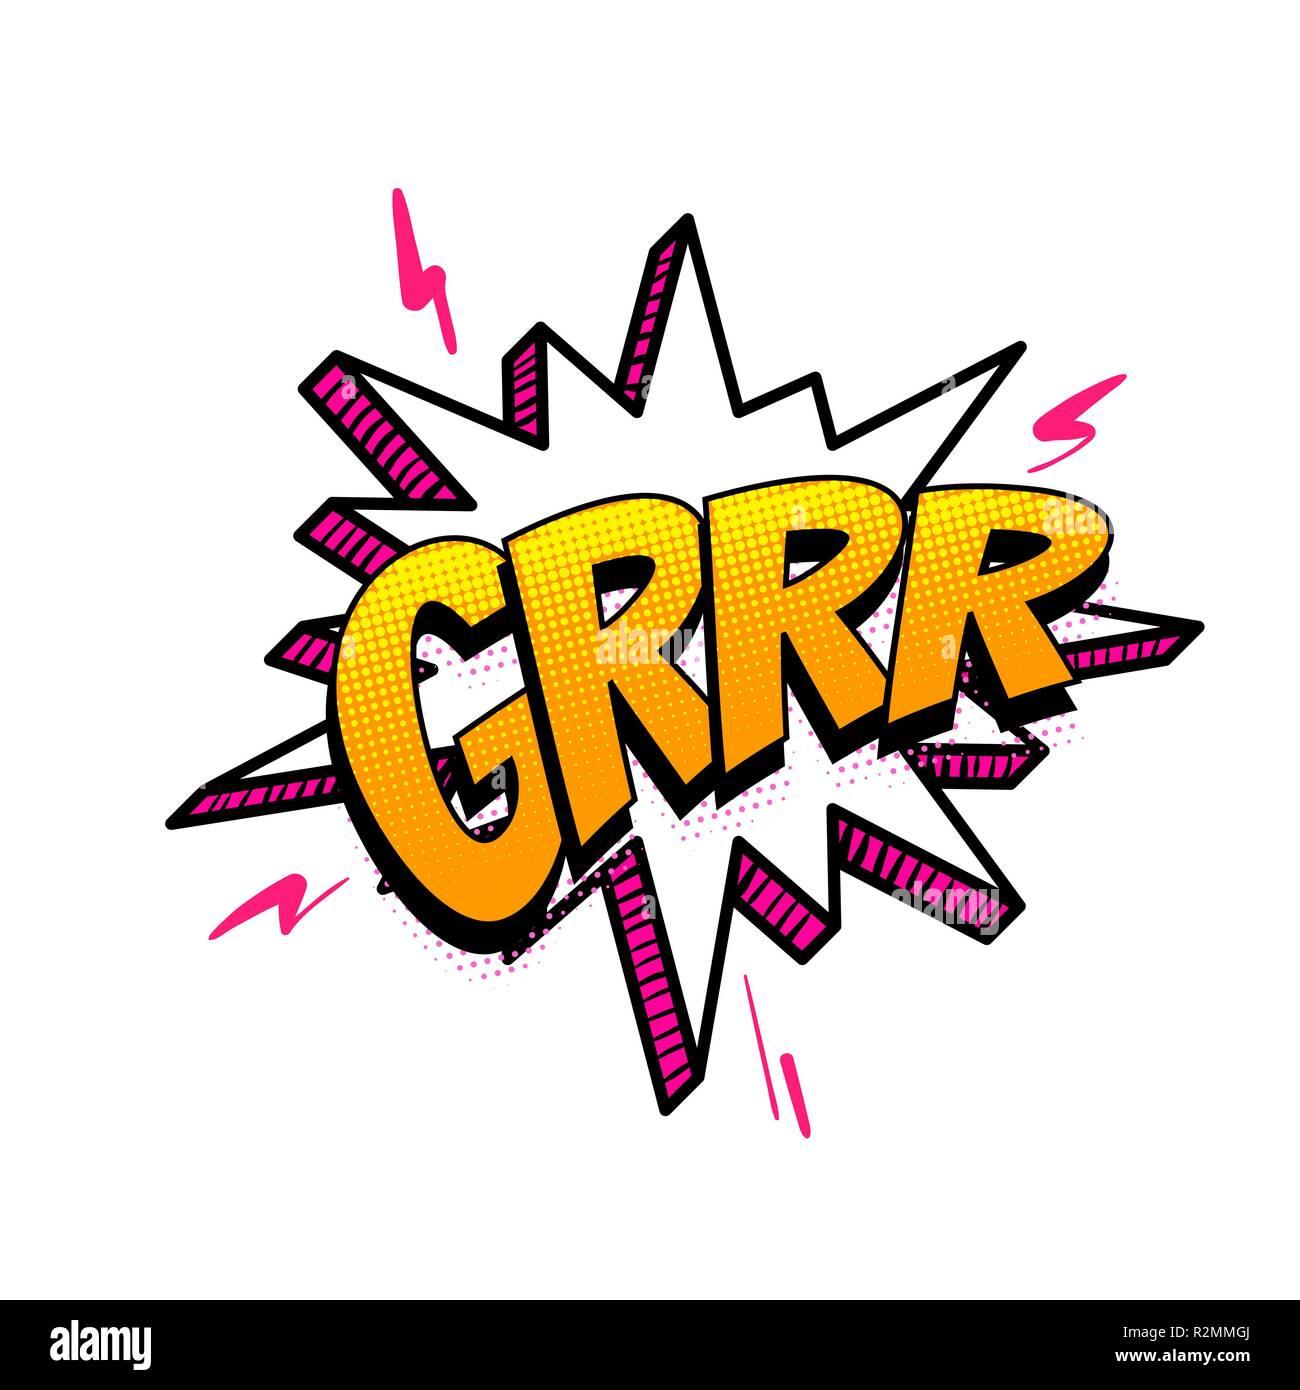 Grrr Stock Photos & Grrr Stock Images - Alamy